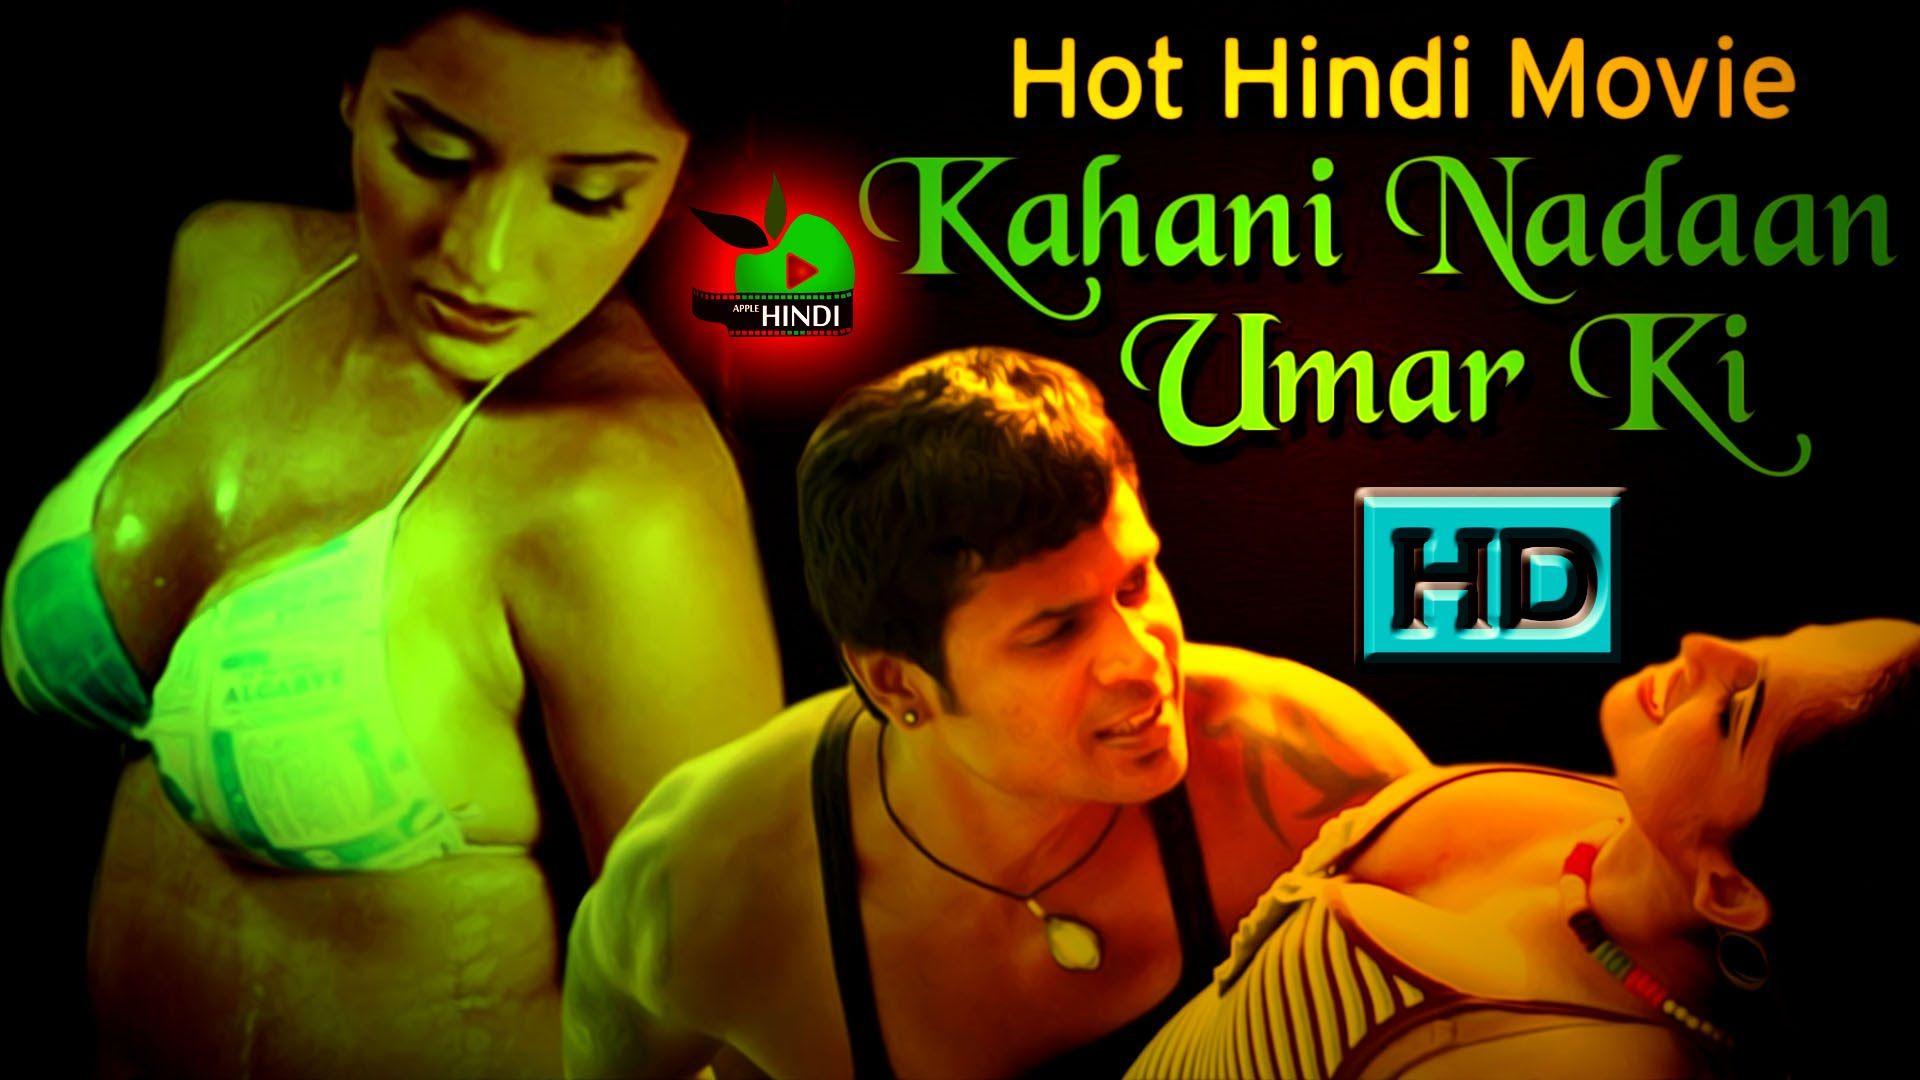 Hindi B Grade Bold Movie  Kahani Nadaan Umar Ki  Hot -2322